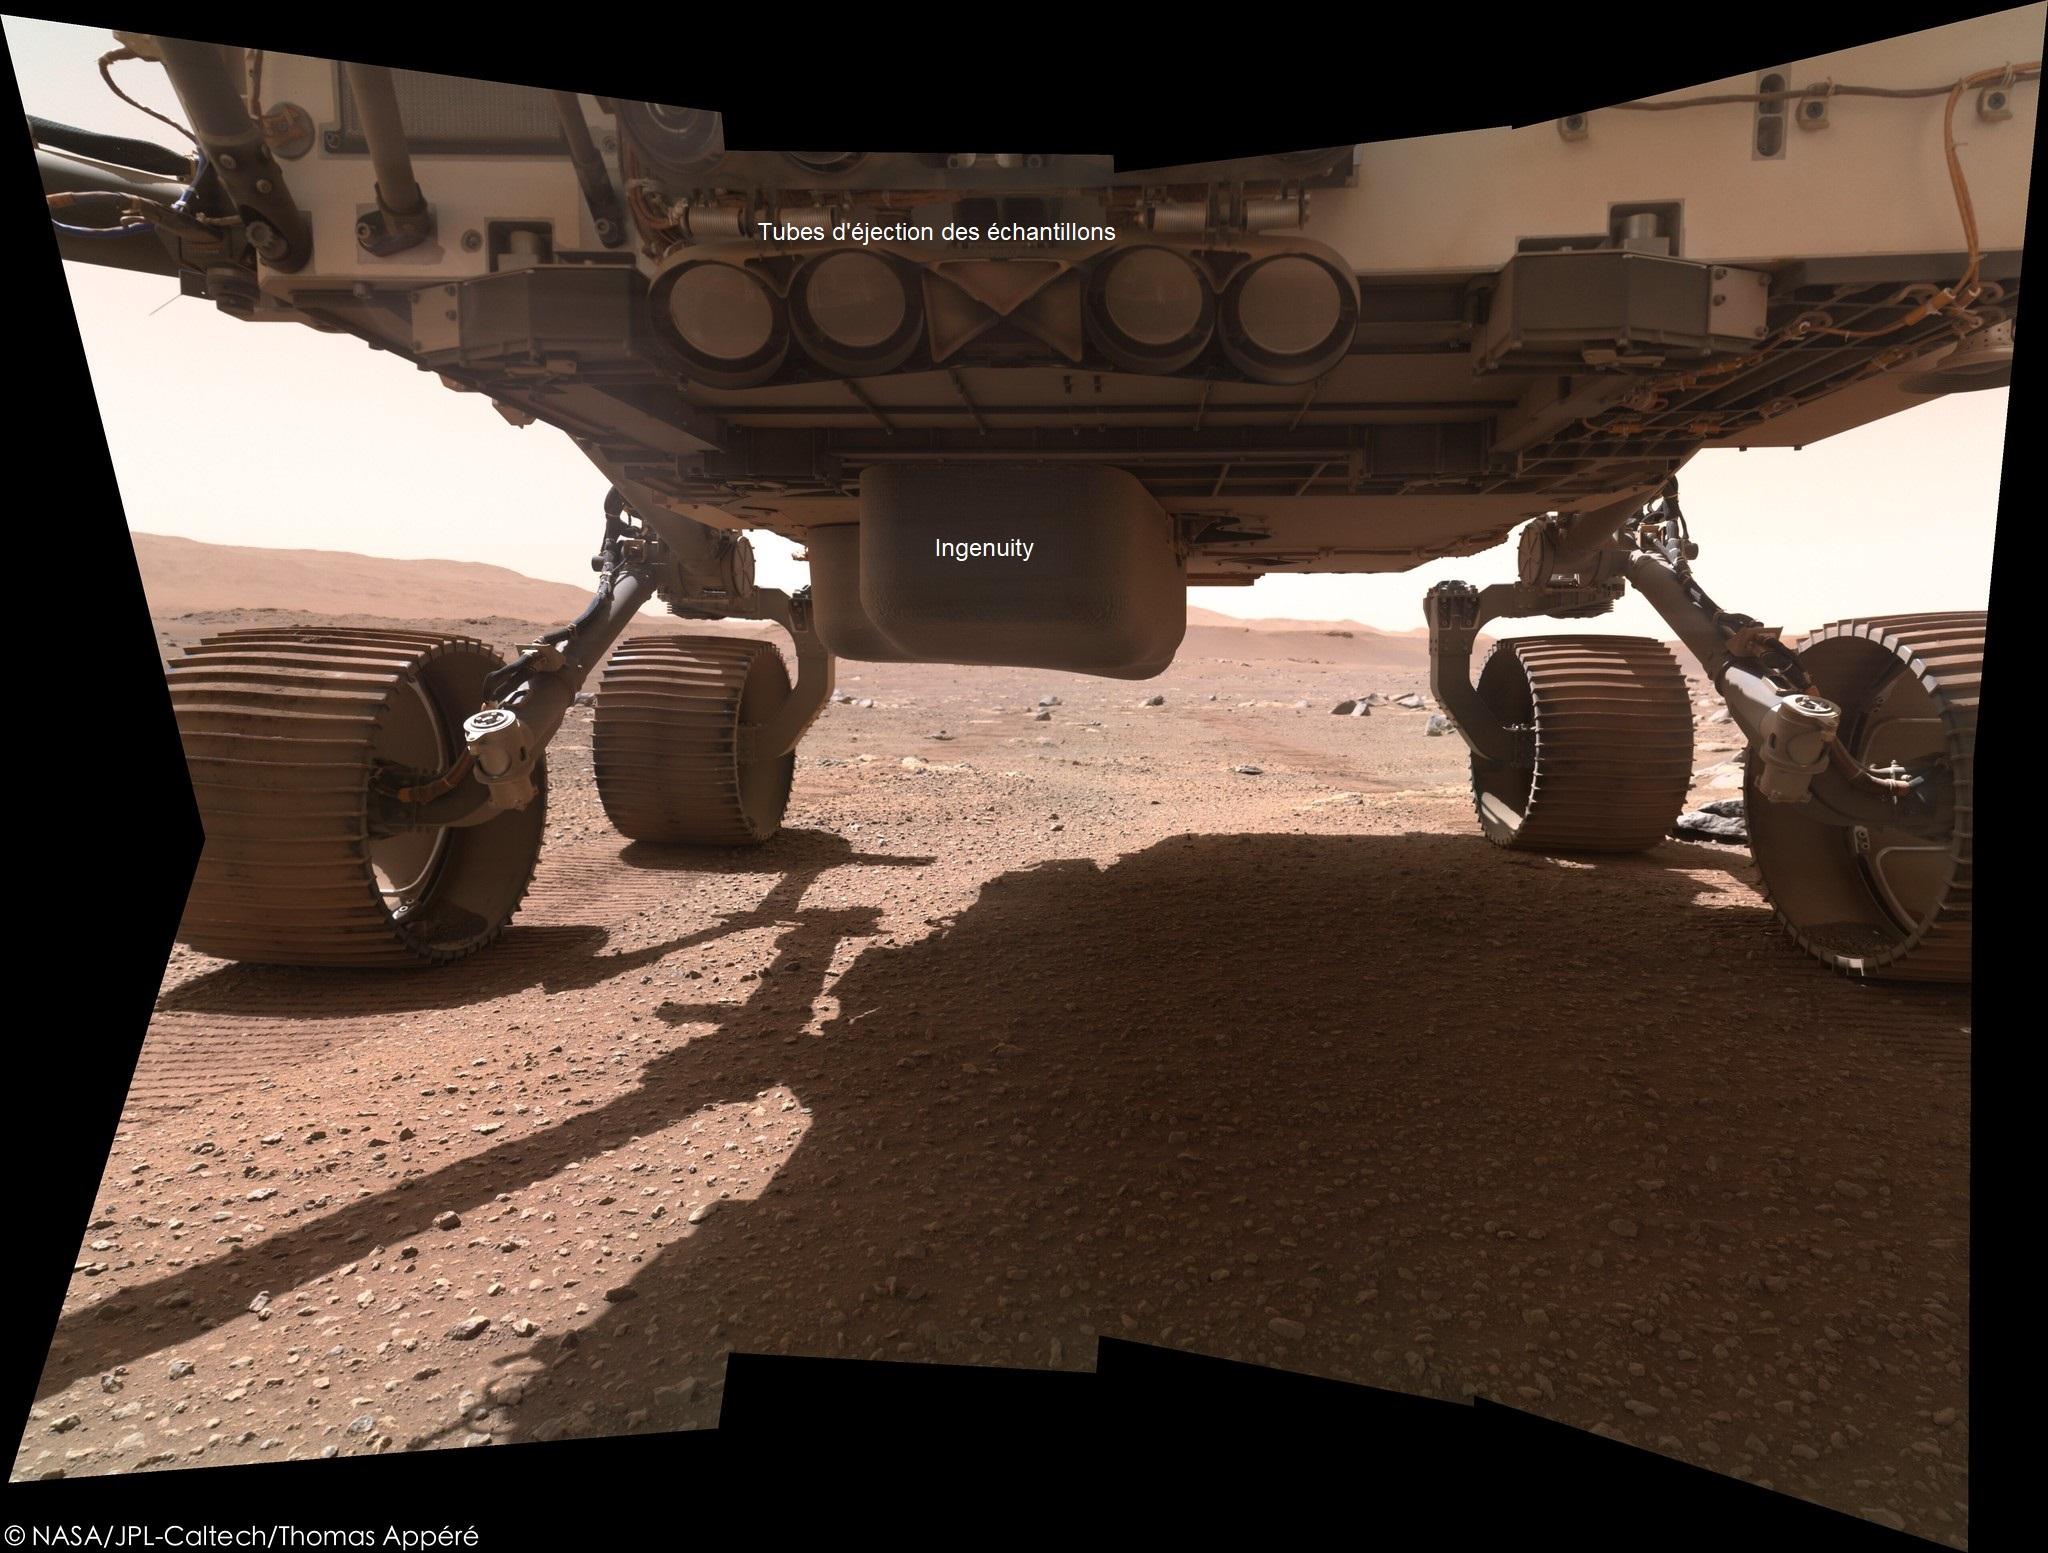 Mars 2020 (Perseverance - Ingenuity) : exploration du cratère Jezero - Page 5 11846